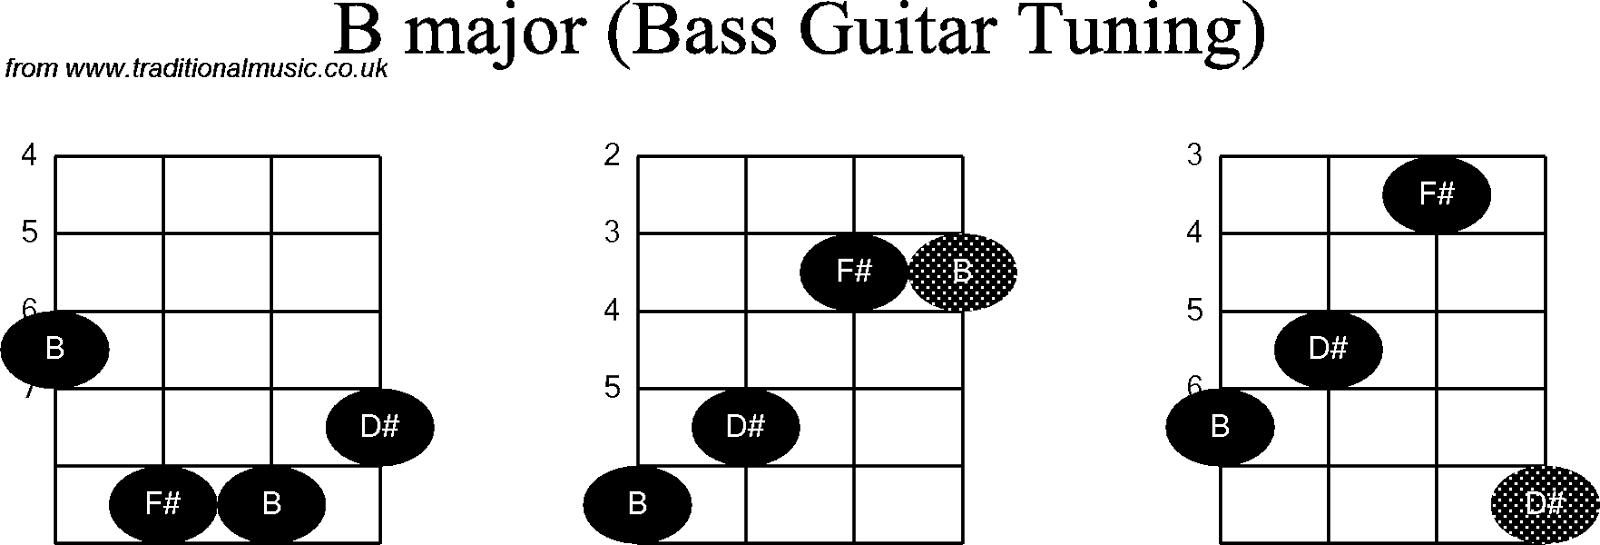 Gambar Kunci Gitar Bass Chords Lengkap Freewaremini Music